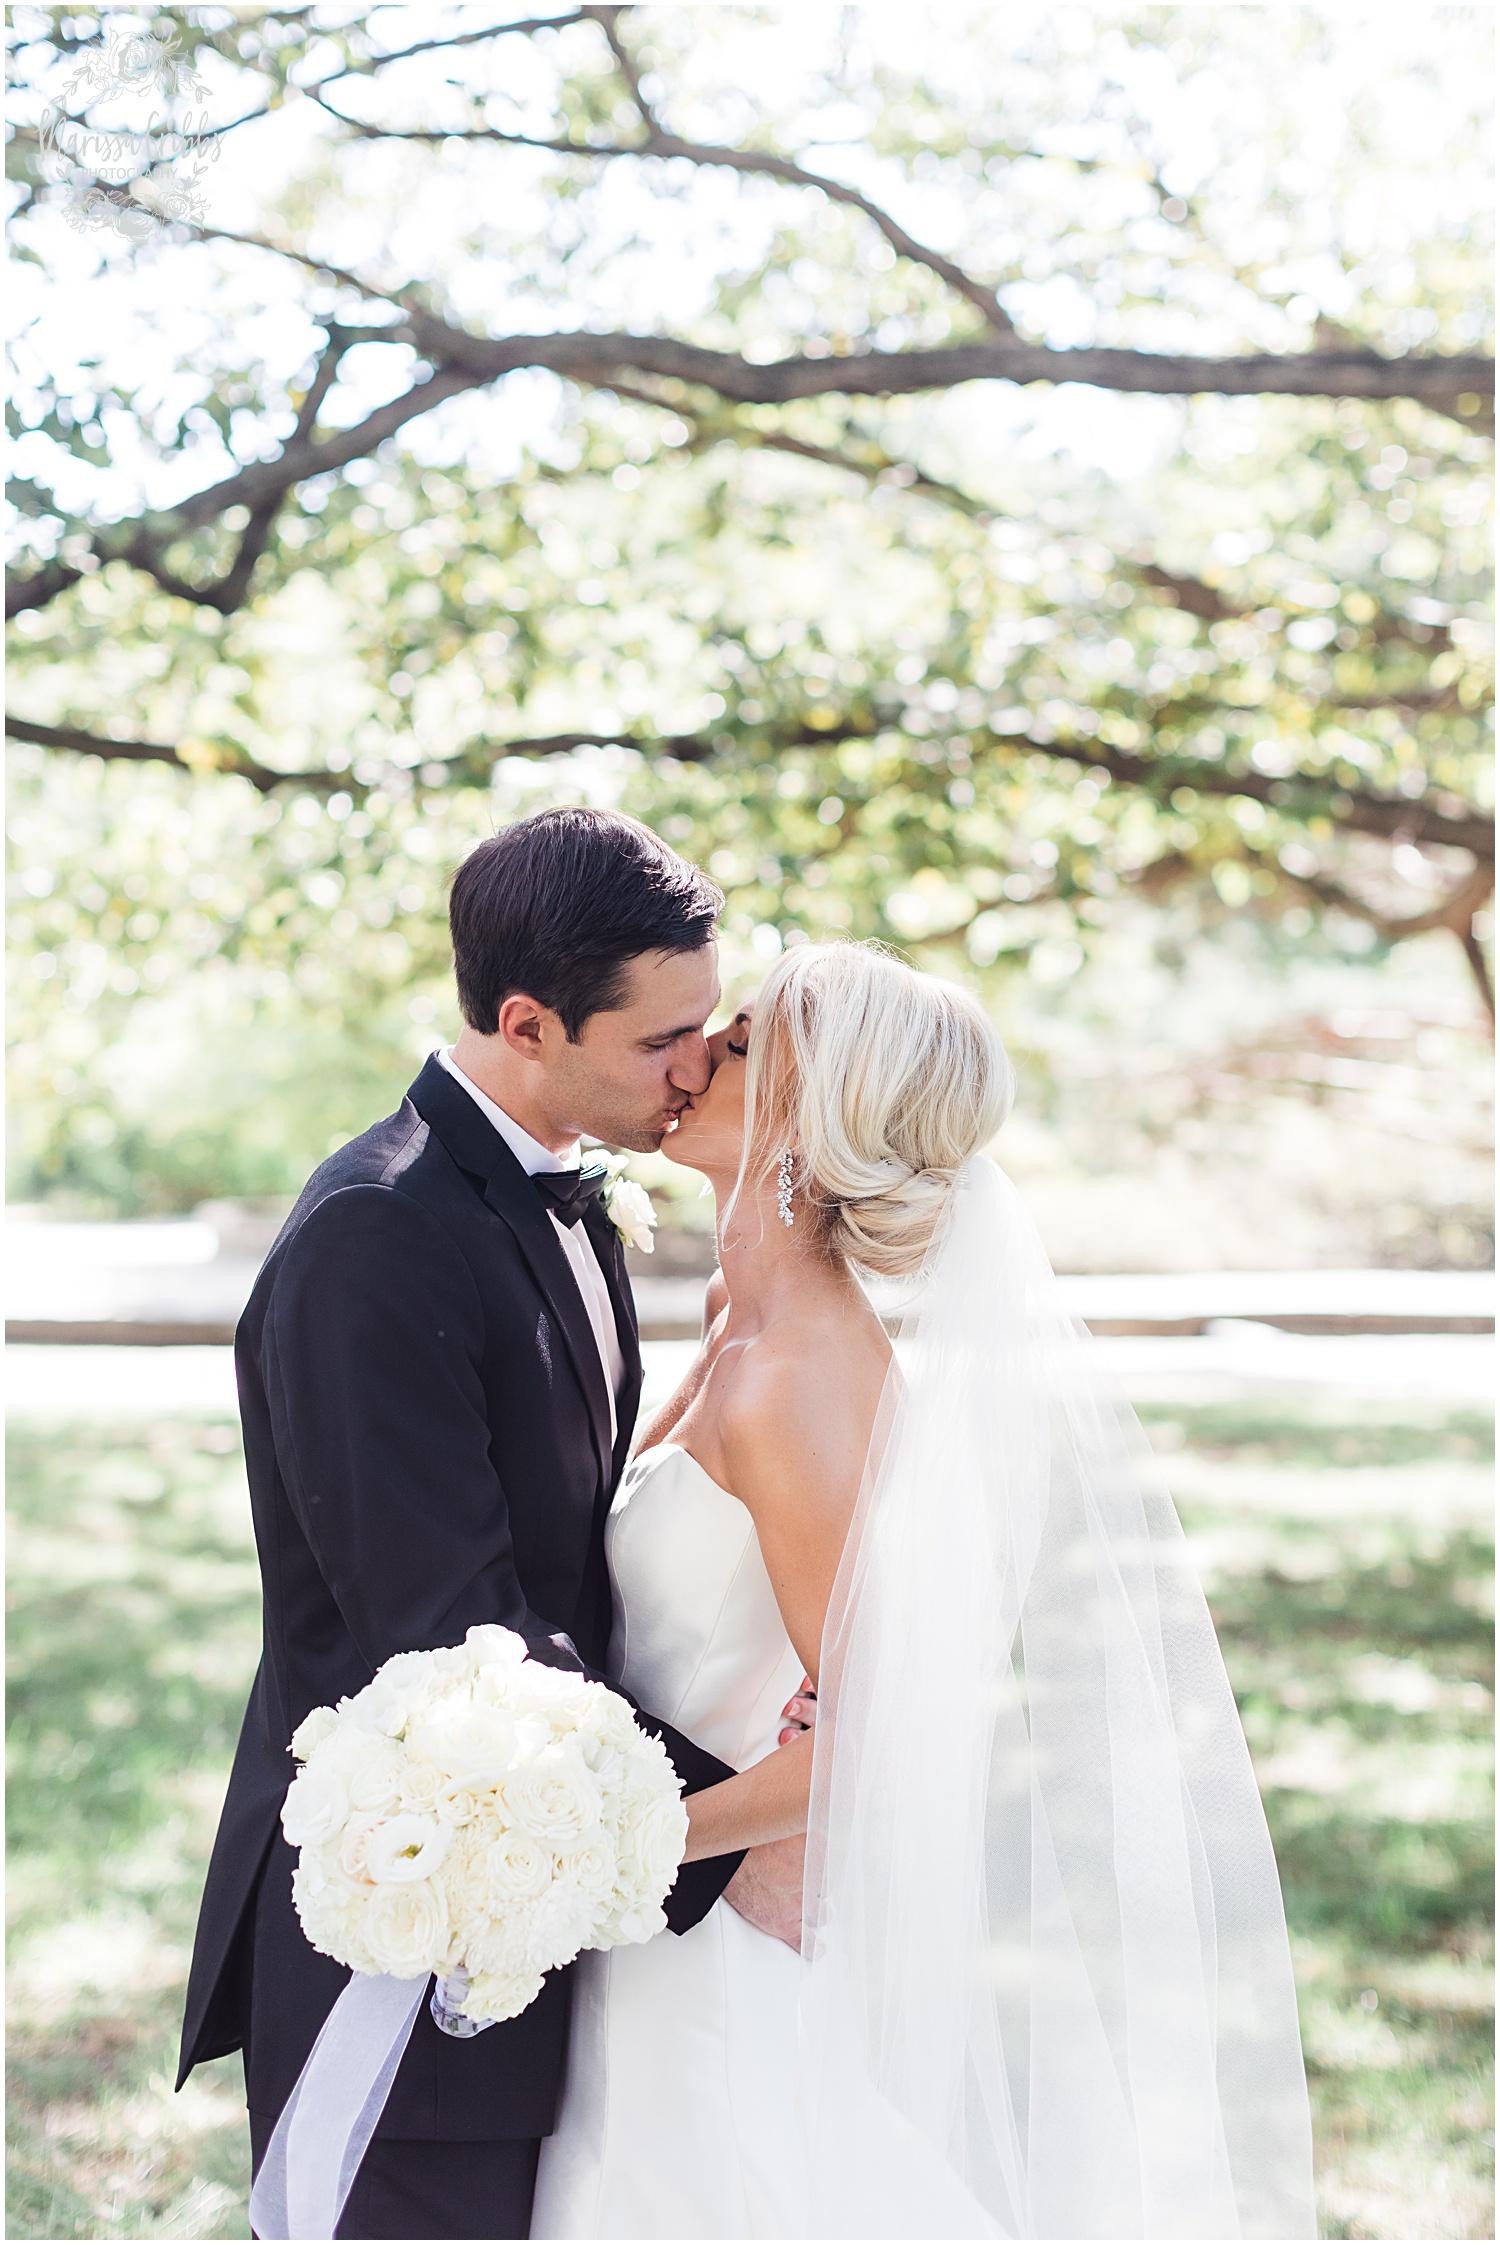 NOLL WEDDING | THE BRASS ON BALTIMORE | MARISSA CRIBBS PHOTOGRAPHY_6310.jpg